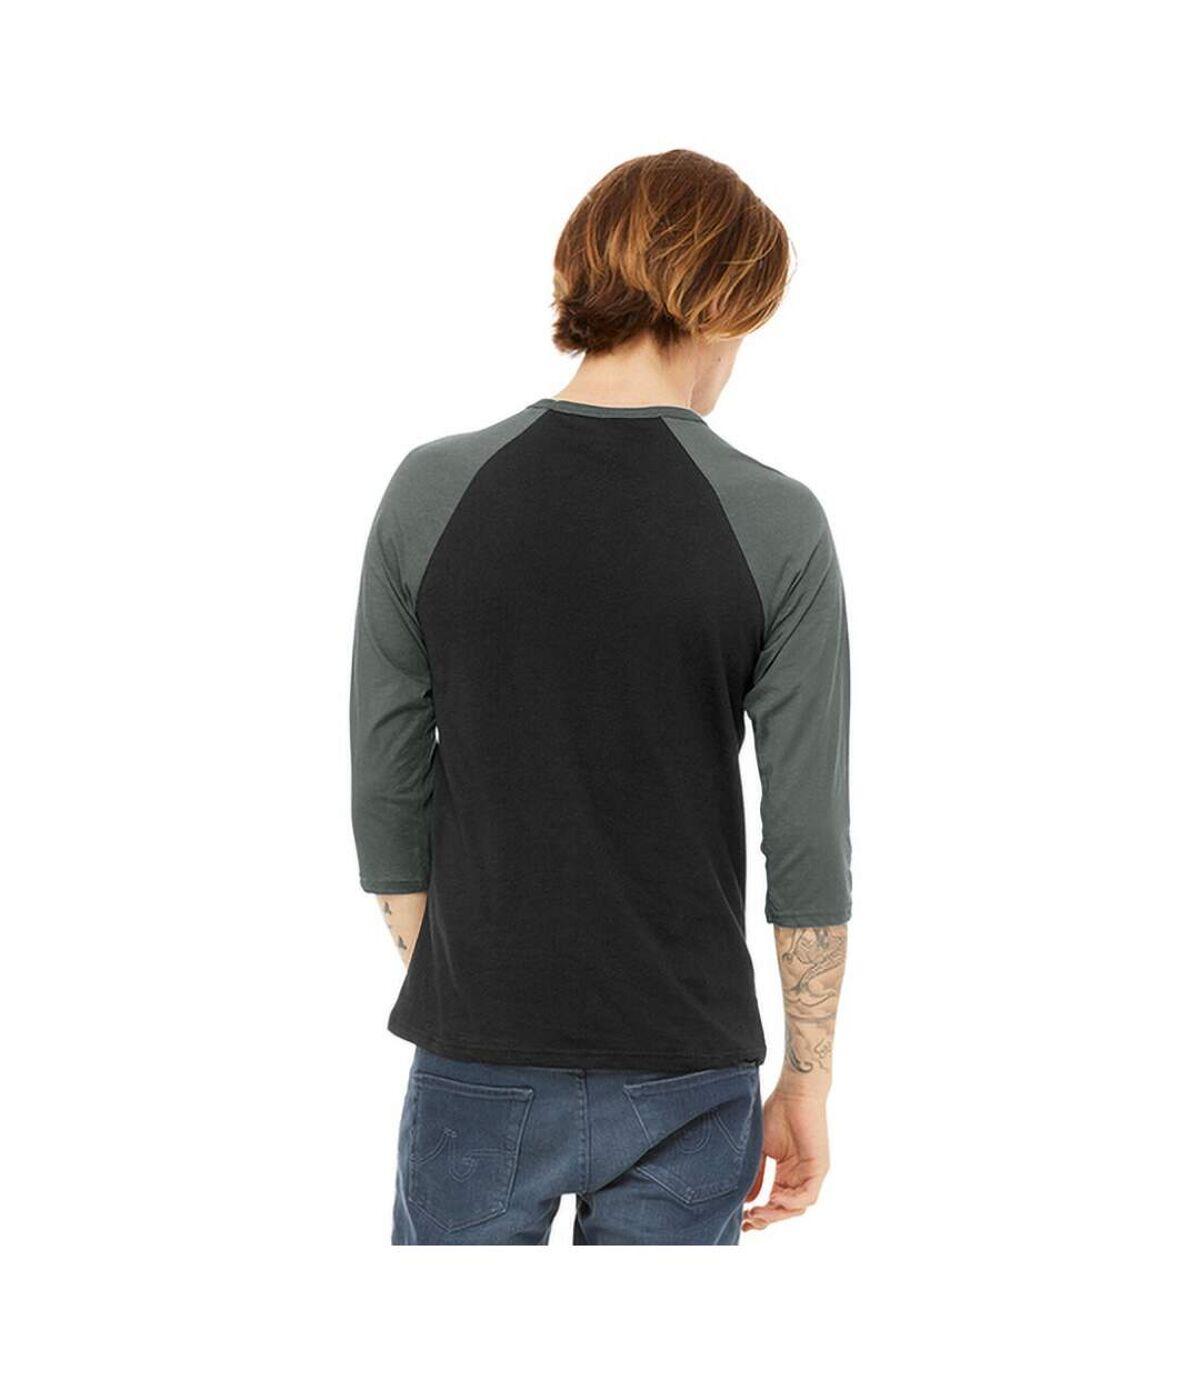 Canvas Mens 3/4 Sleeve Baseball T-Shirt (Black/ Deep Heather Grey) - UTBC1332